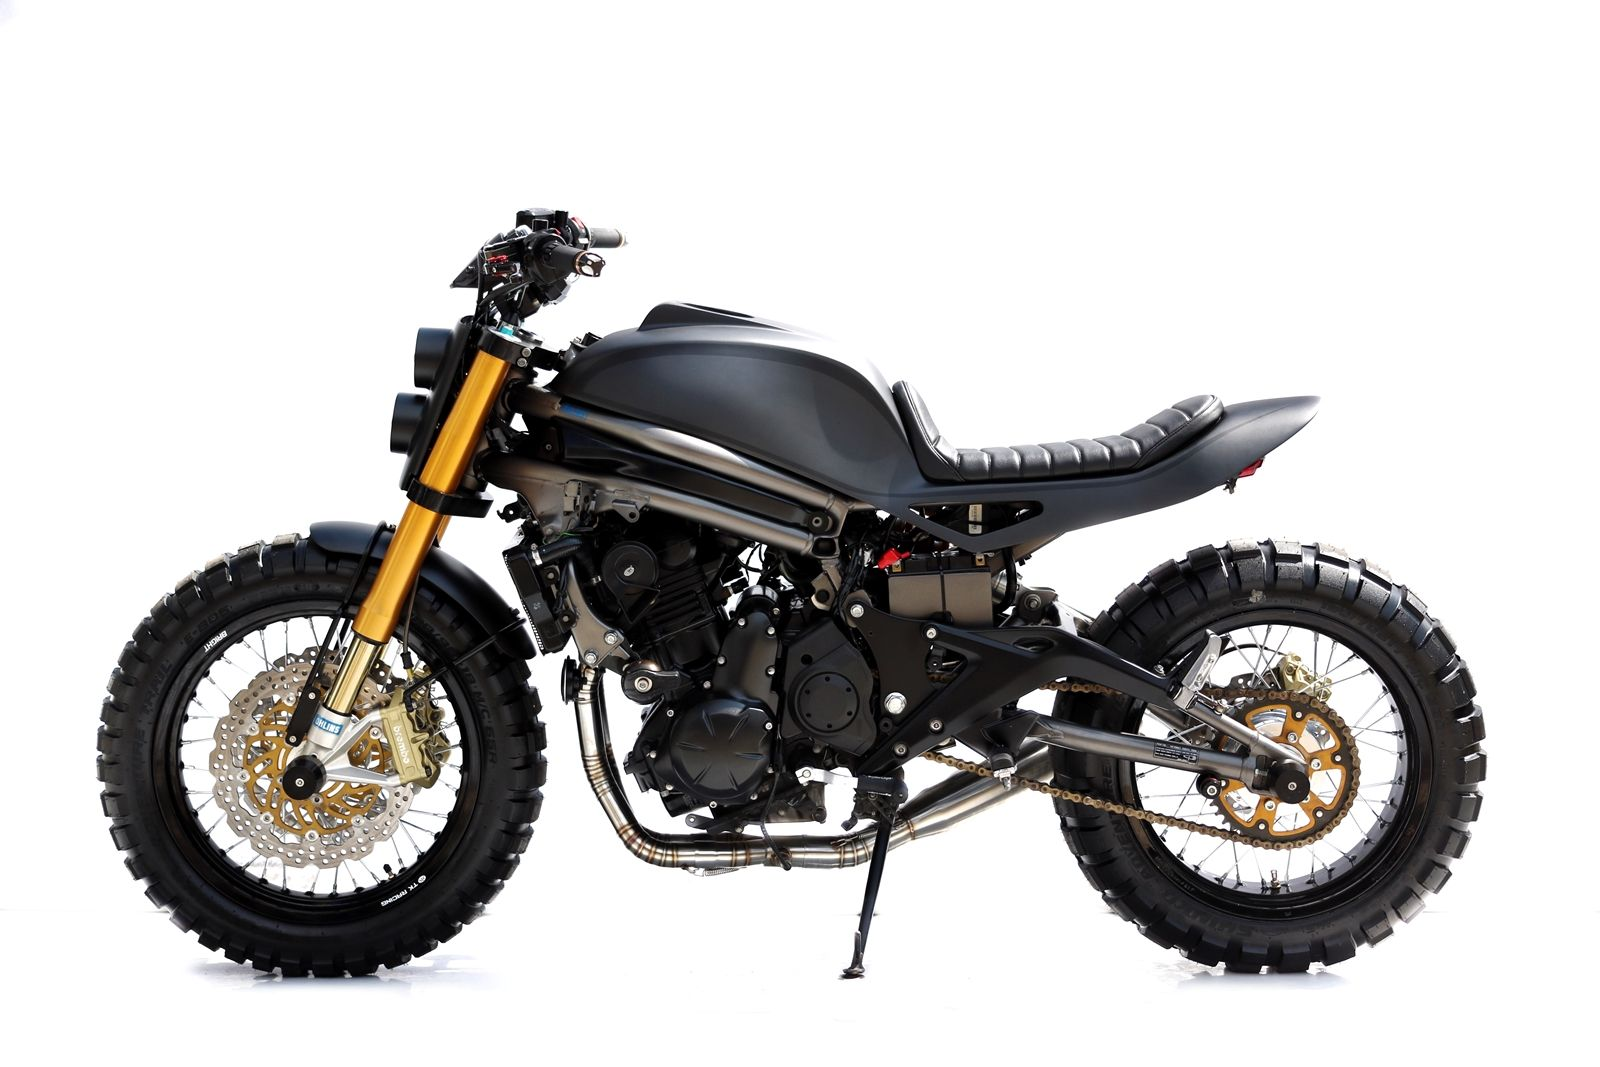 Studio Motor Kawasaki Ninja 650 Motorcycle